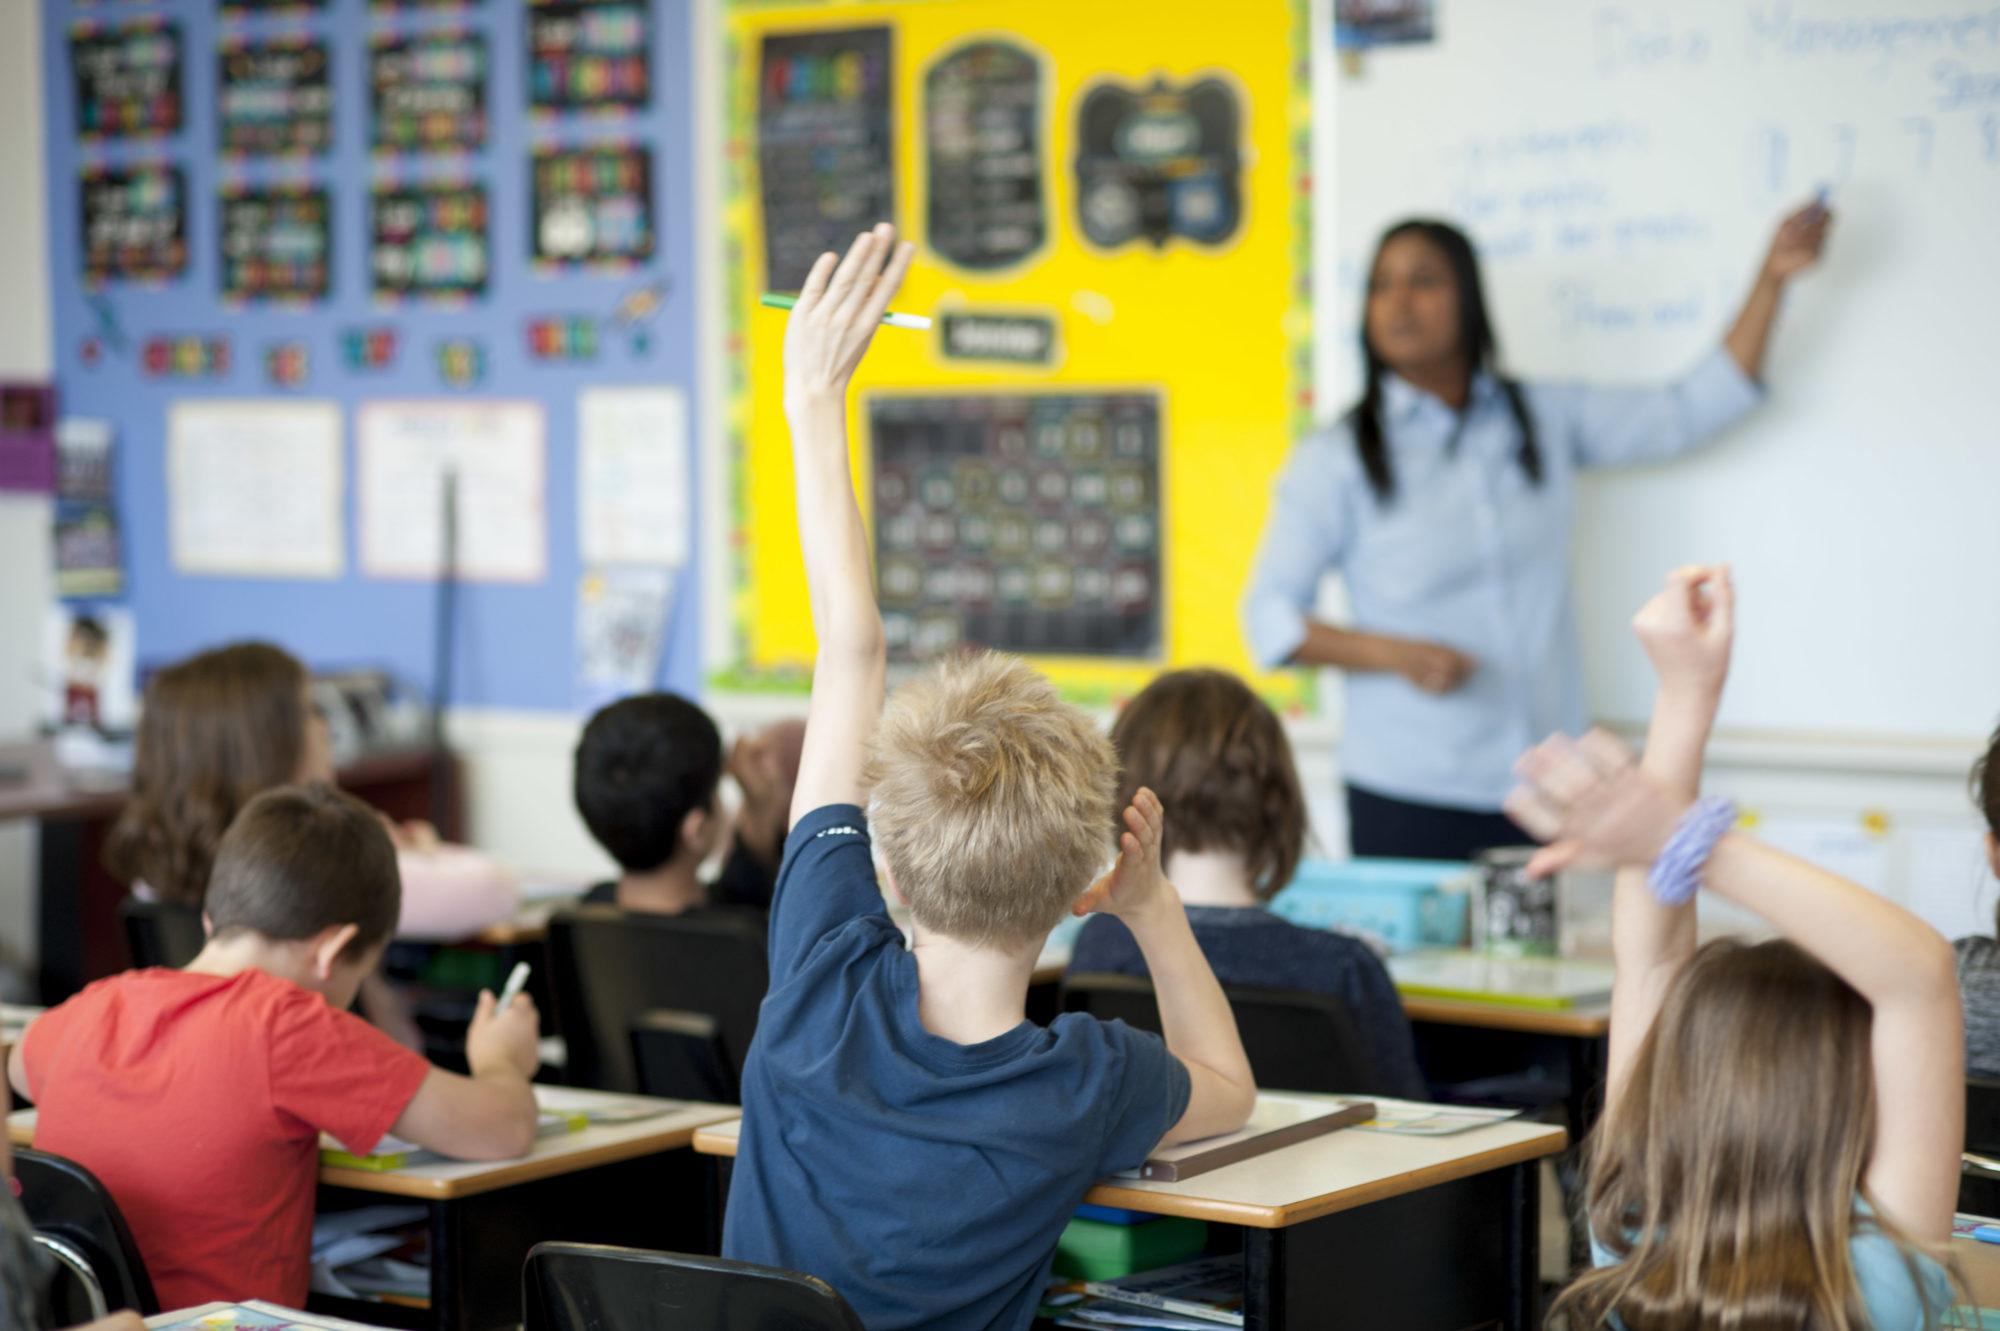 boy raising hand in classroom